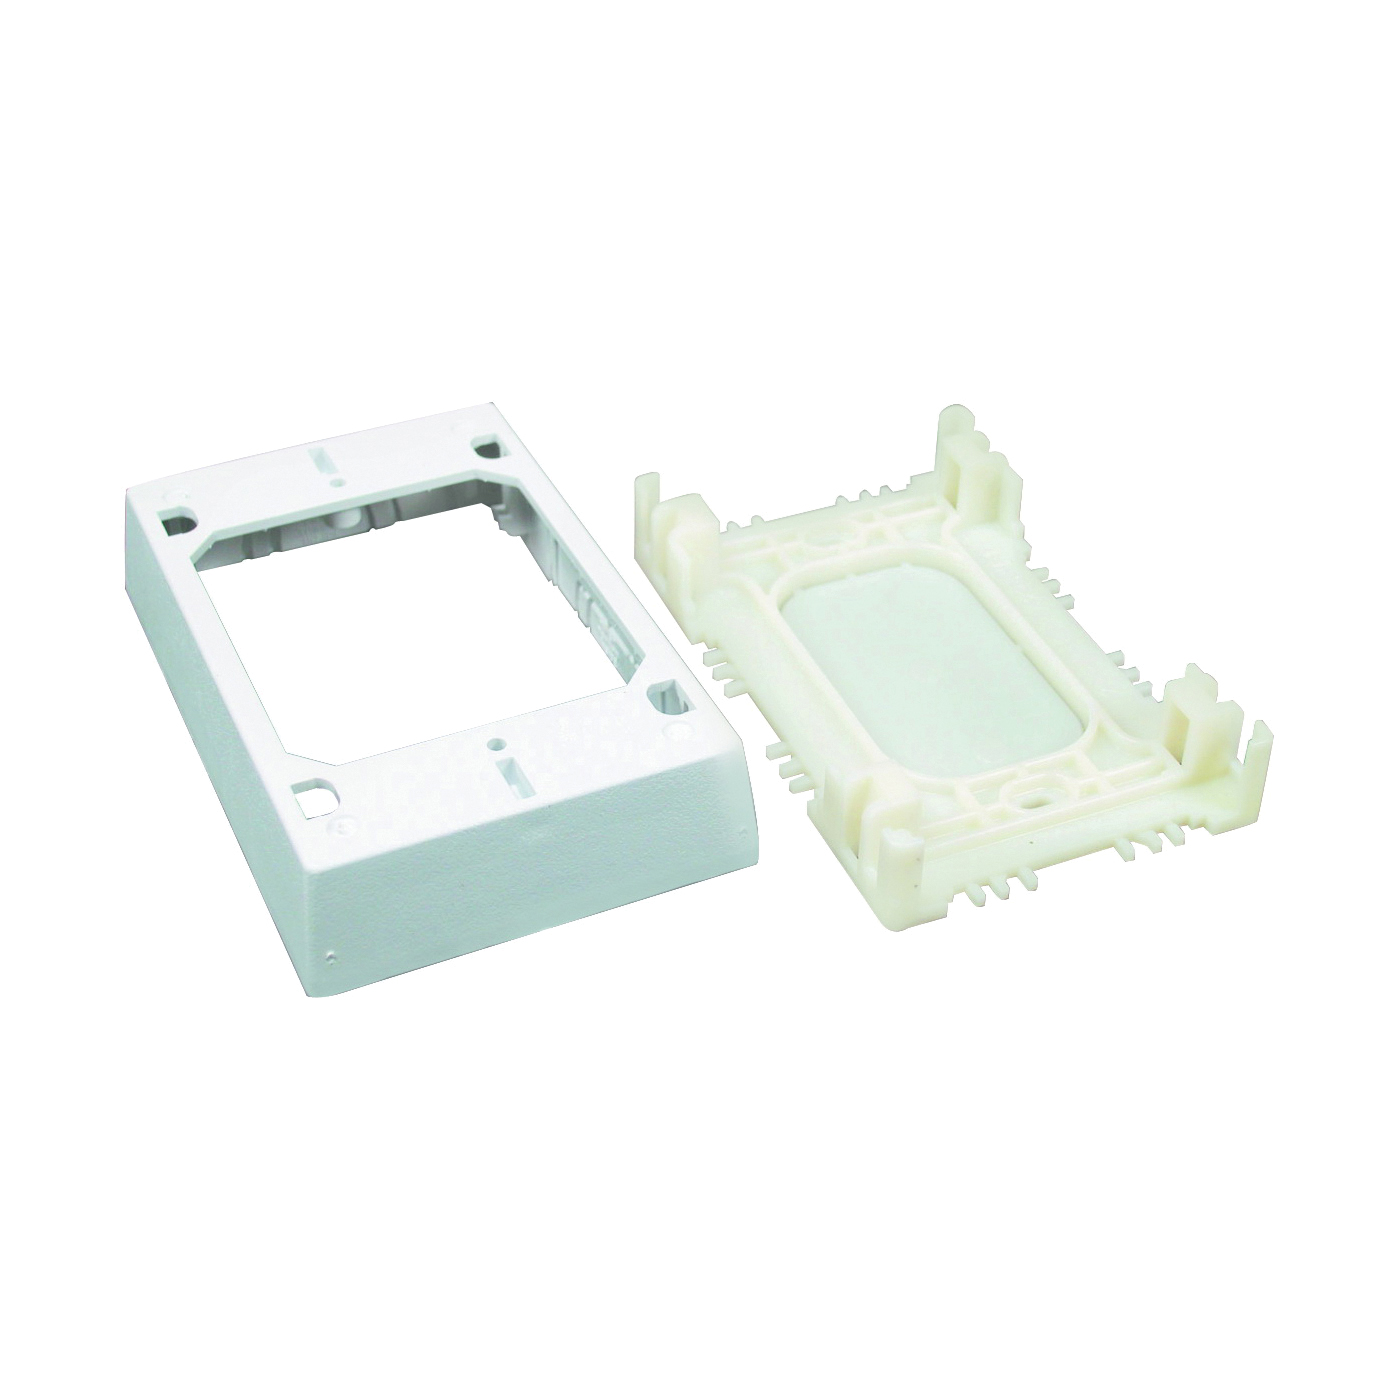 Picture of Legrand Wiremold NMW2 Starter Box, White